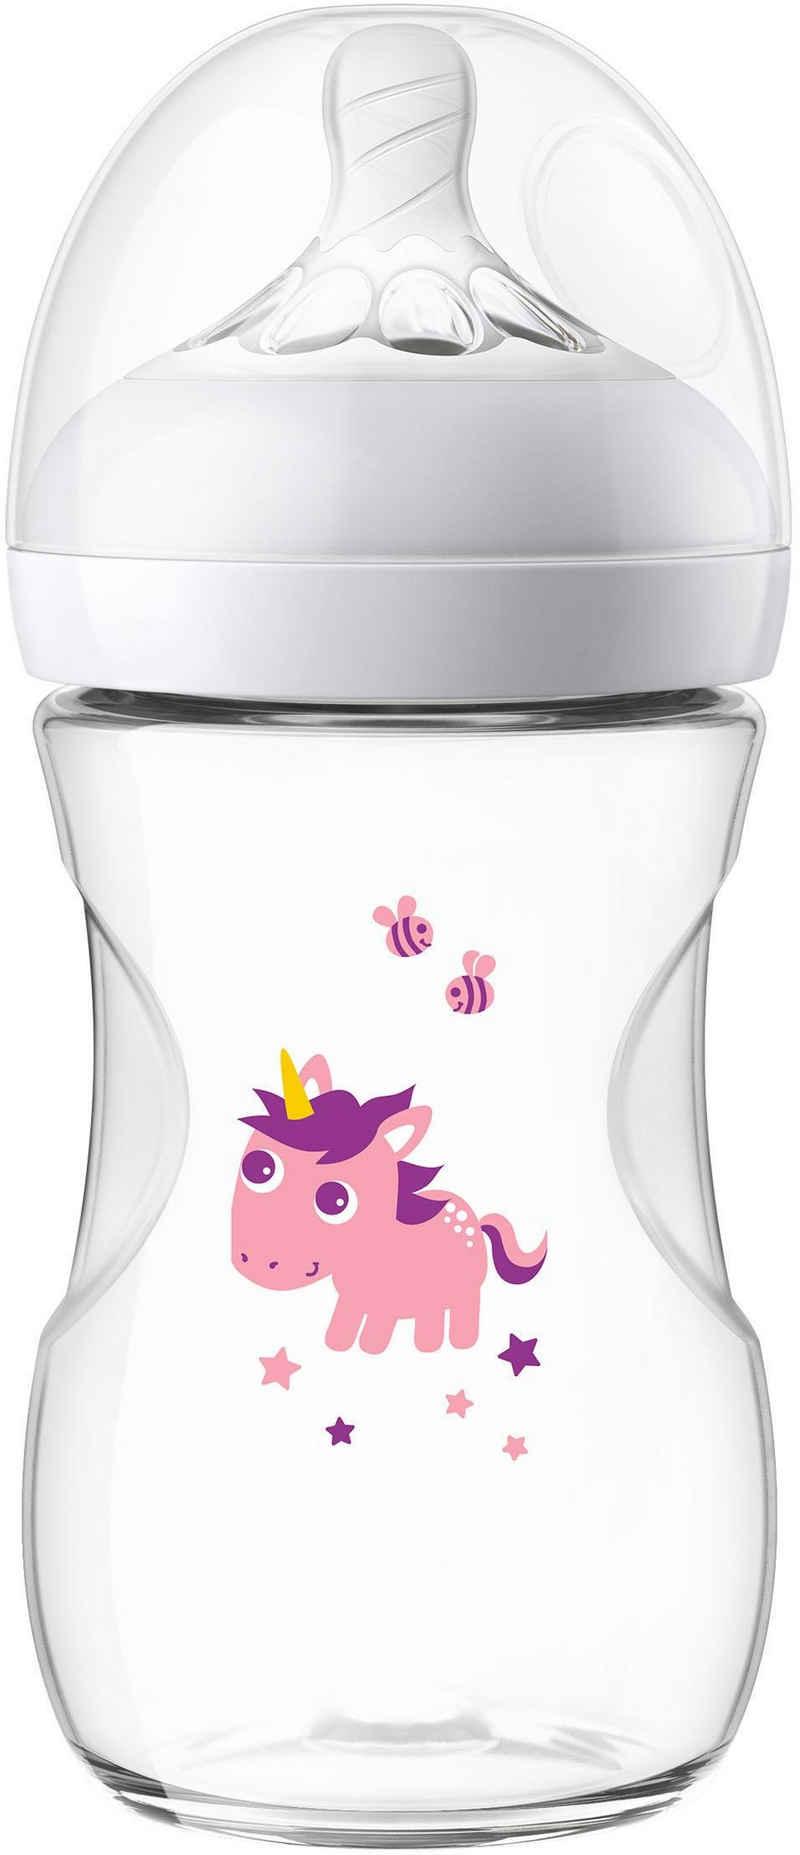 Philips AVENT Babyflasche »Natural Flasche SCF070/25«, Anti-Kolik-System